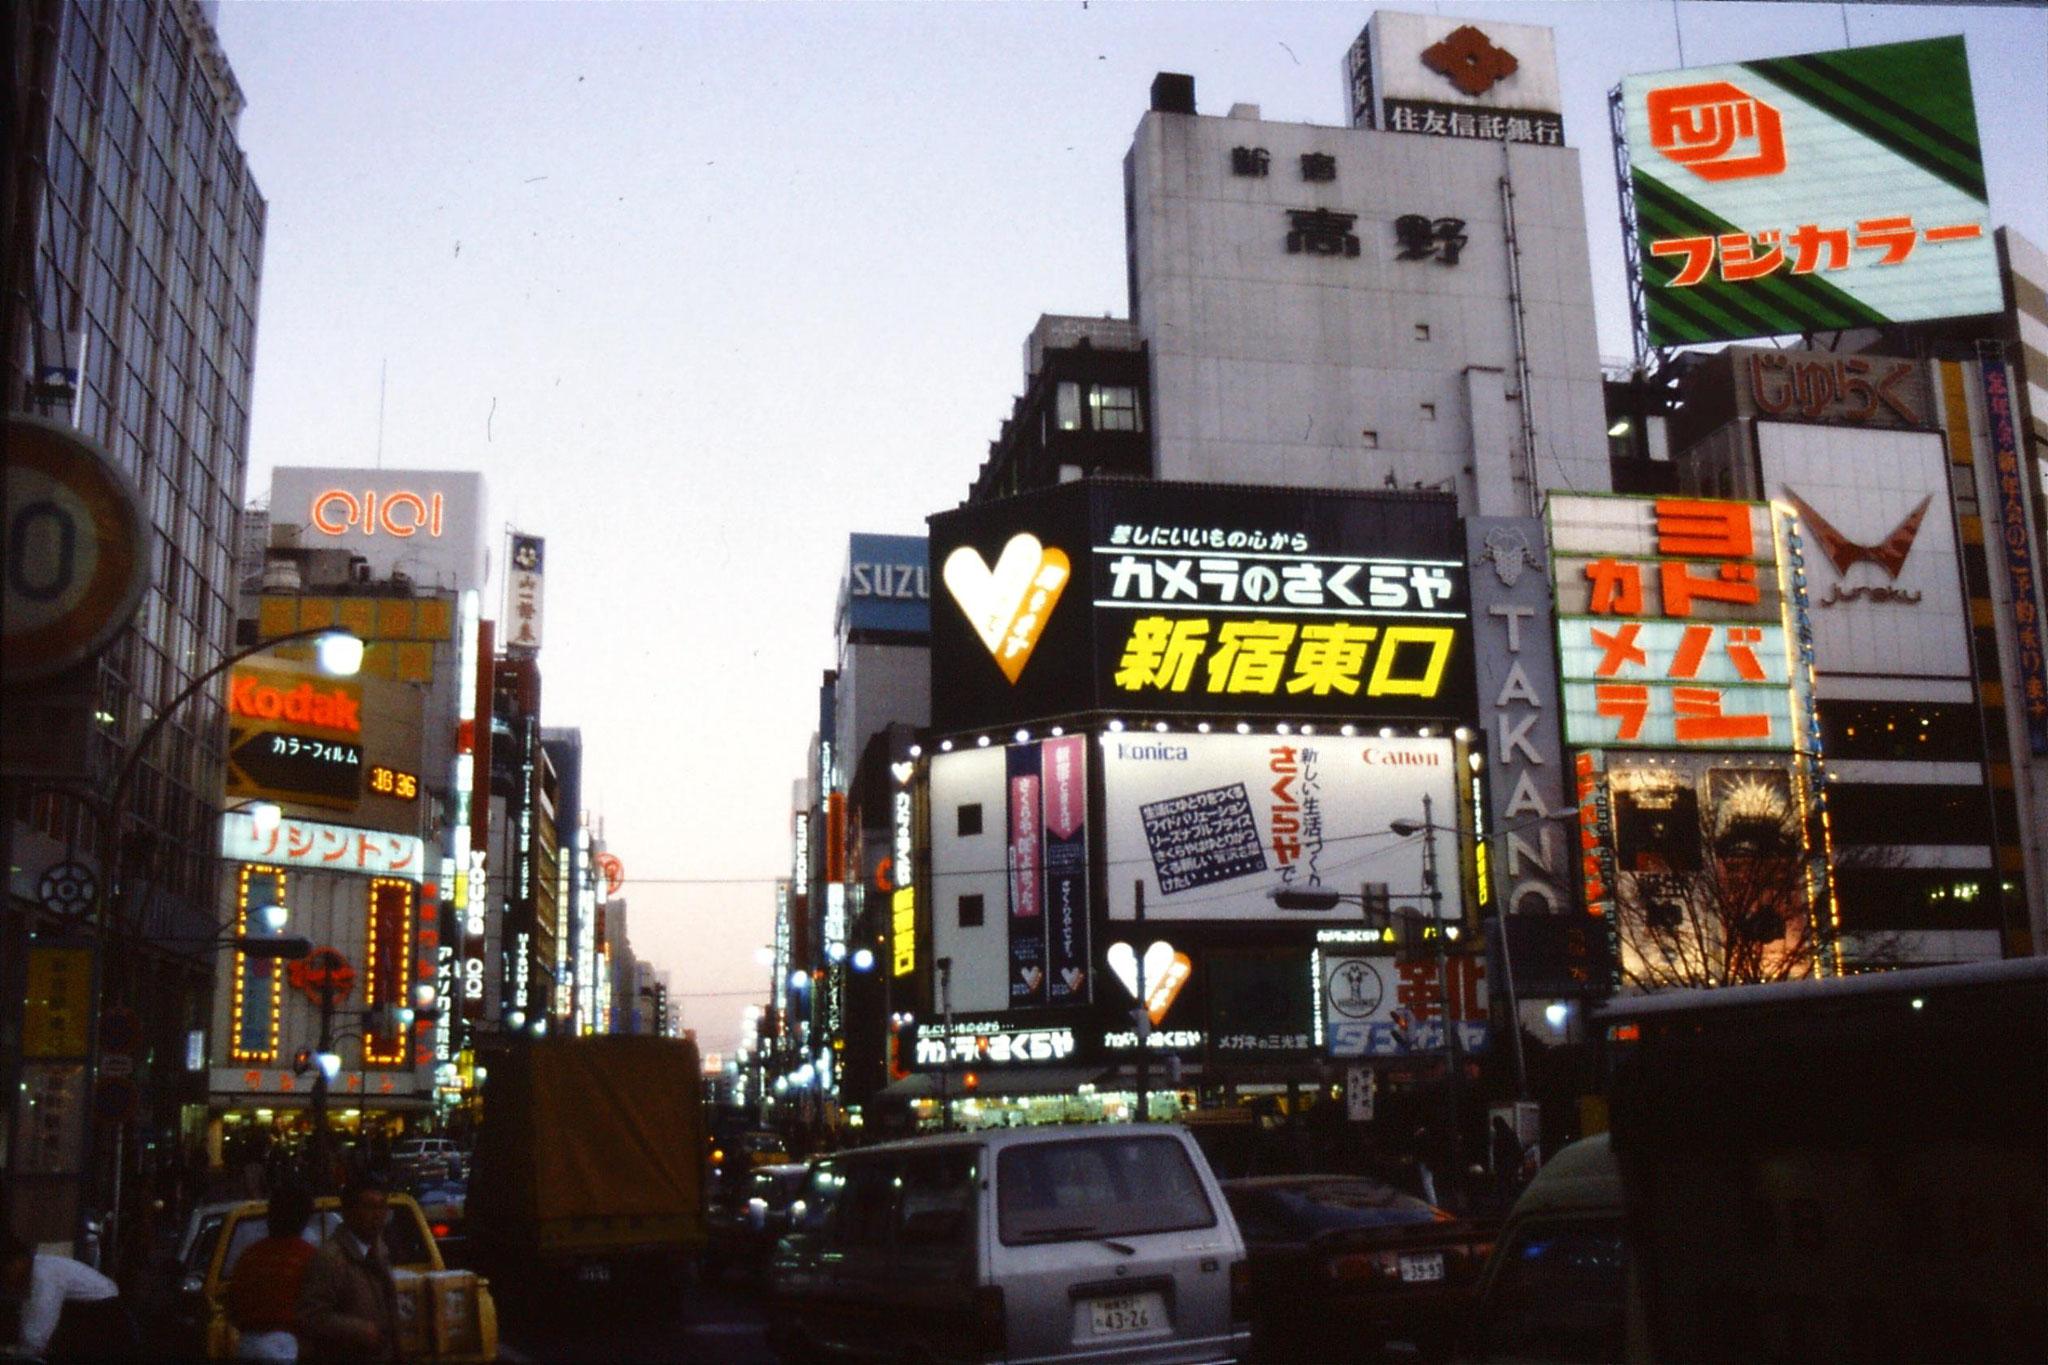 28/12/1988: 26: Tokyo